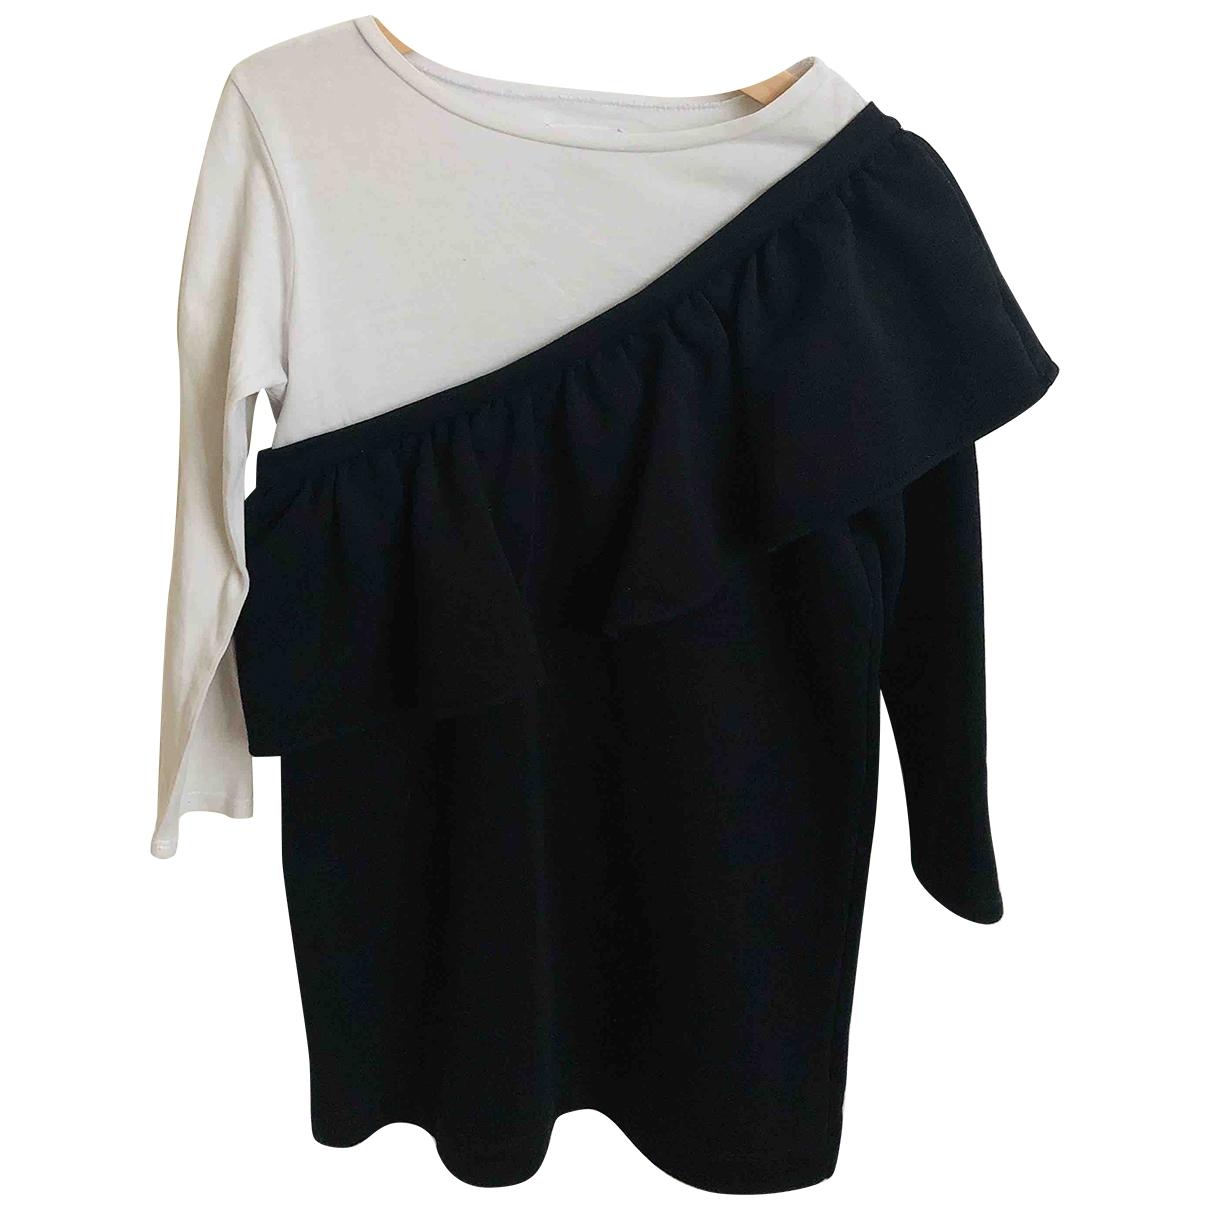 Douuod \N Kleid in  Schwarz Baumwolle